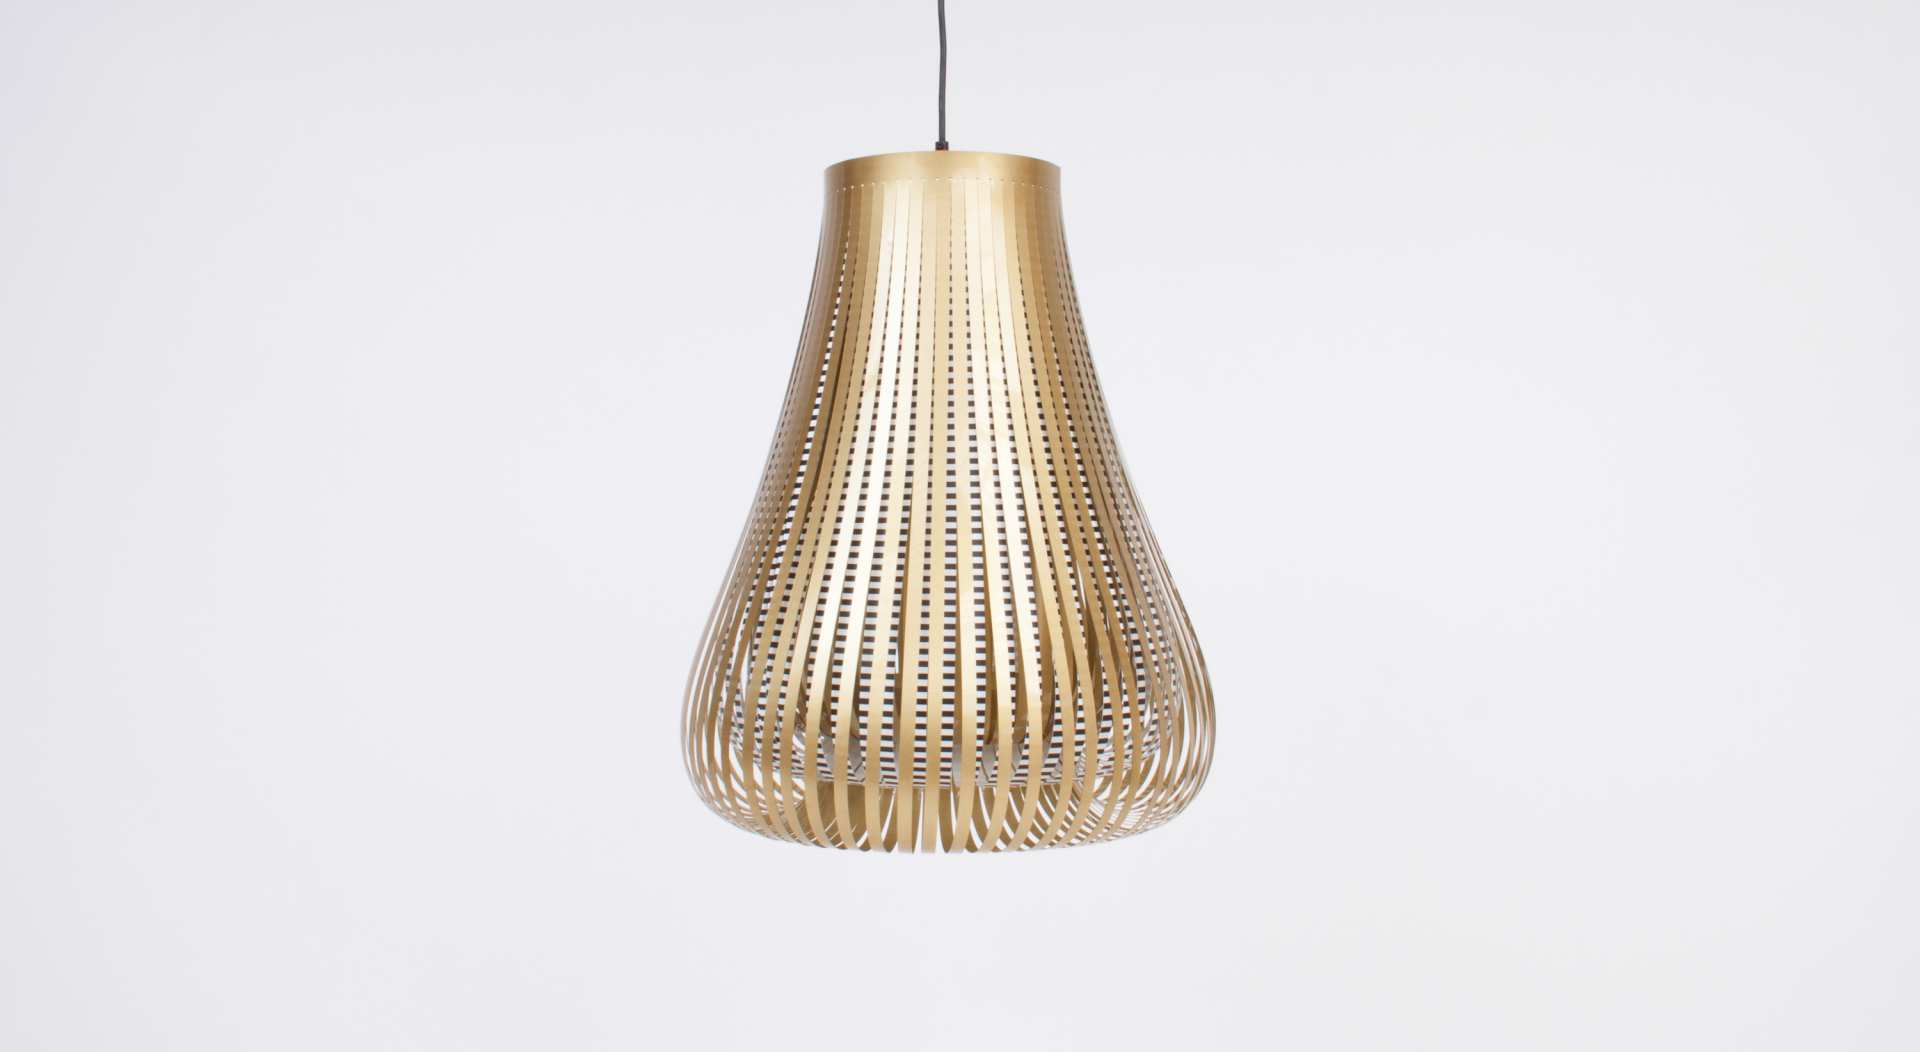 droplet_lamp_verlichting_interieurstyling_interieurarchitectuur